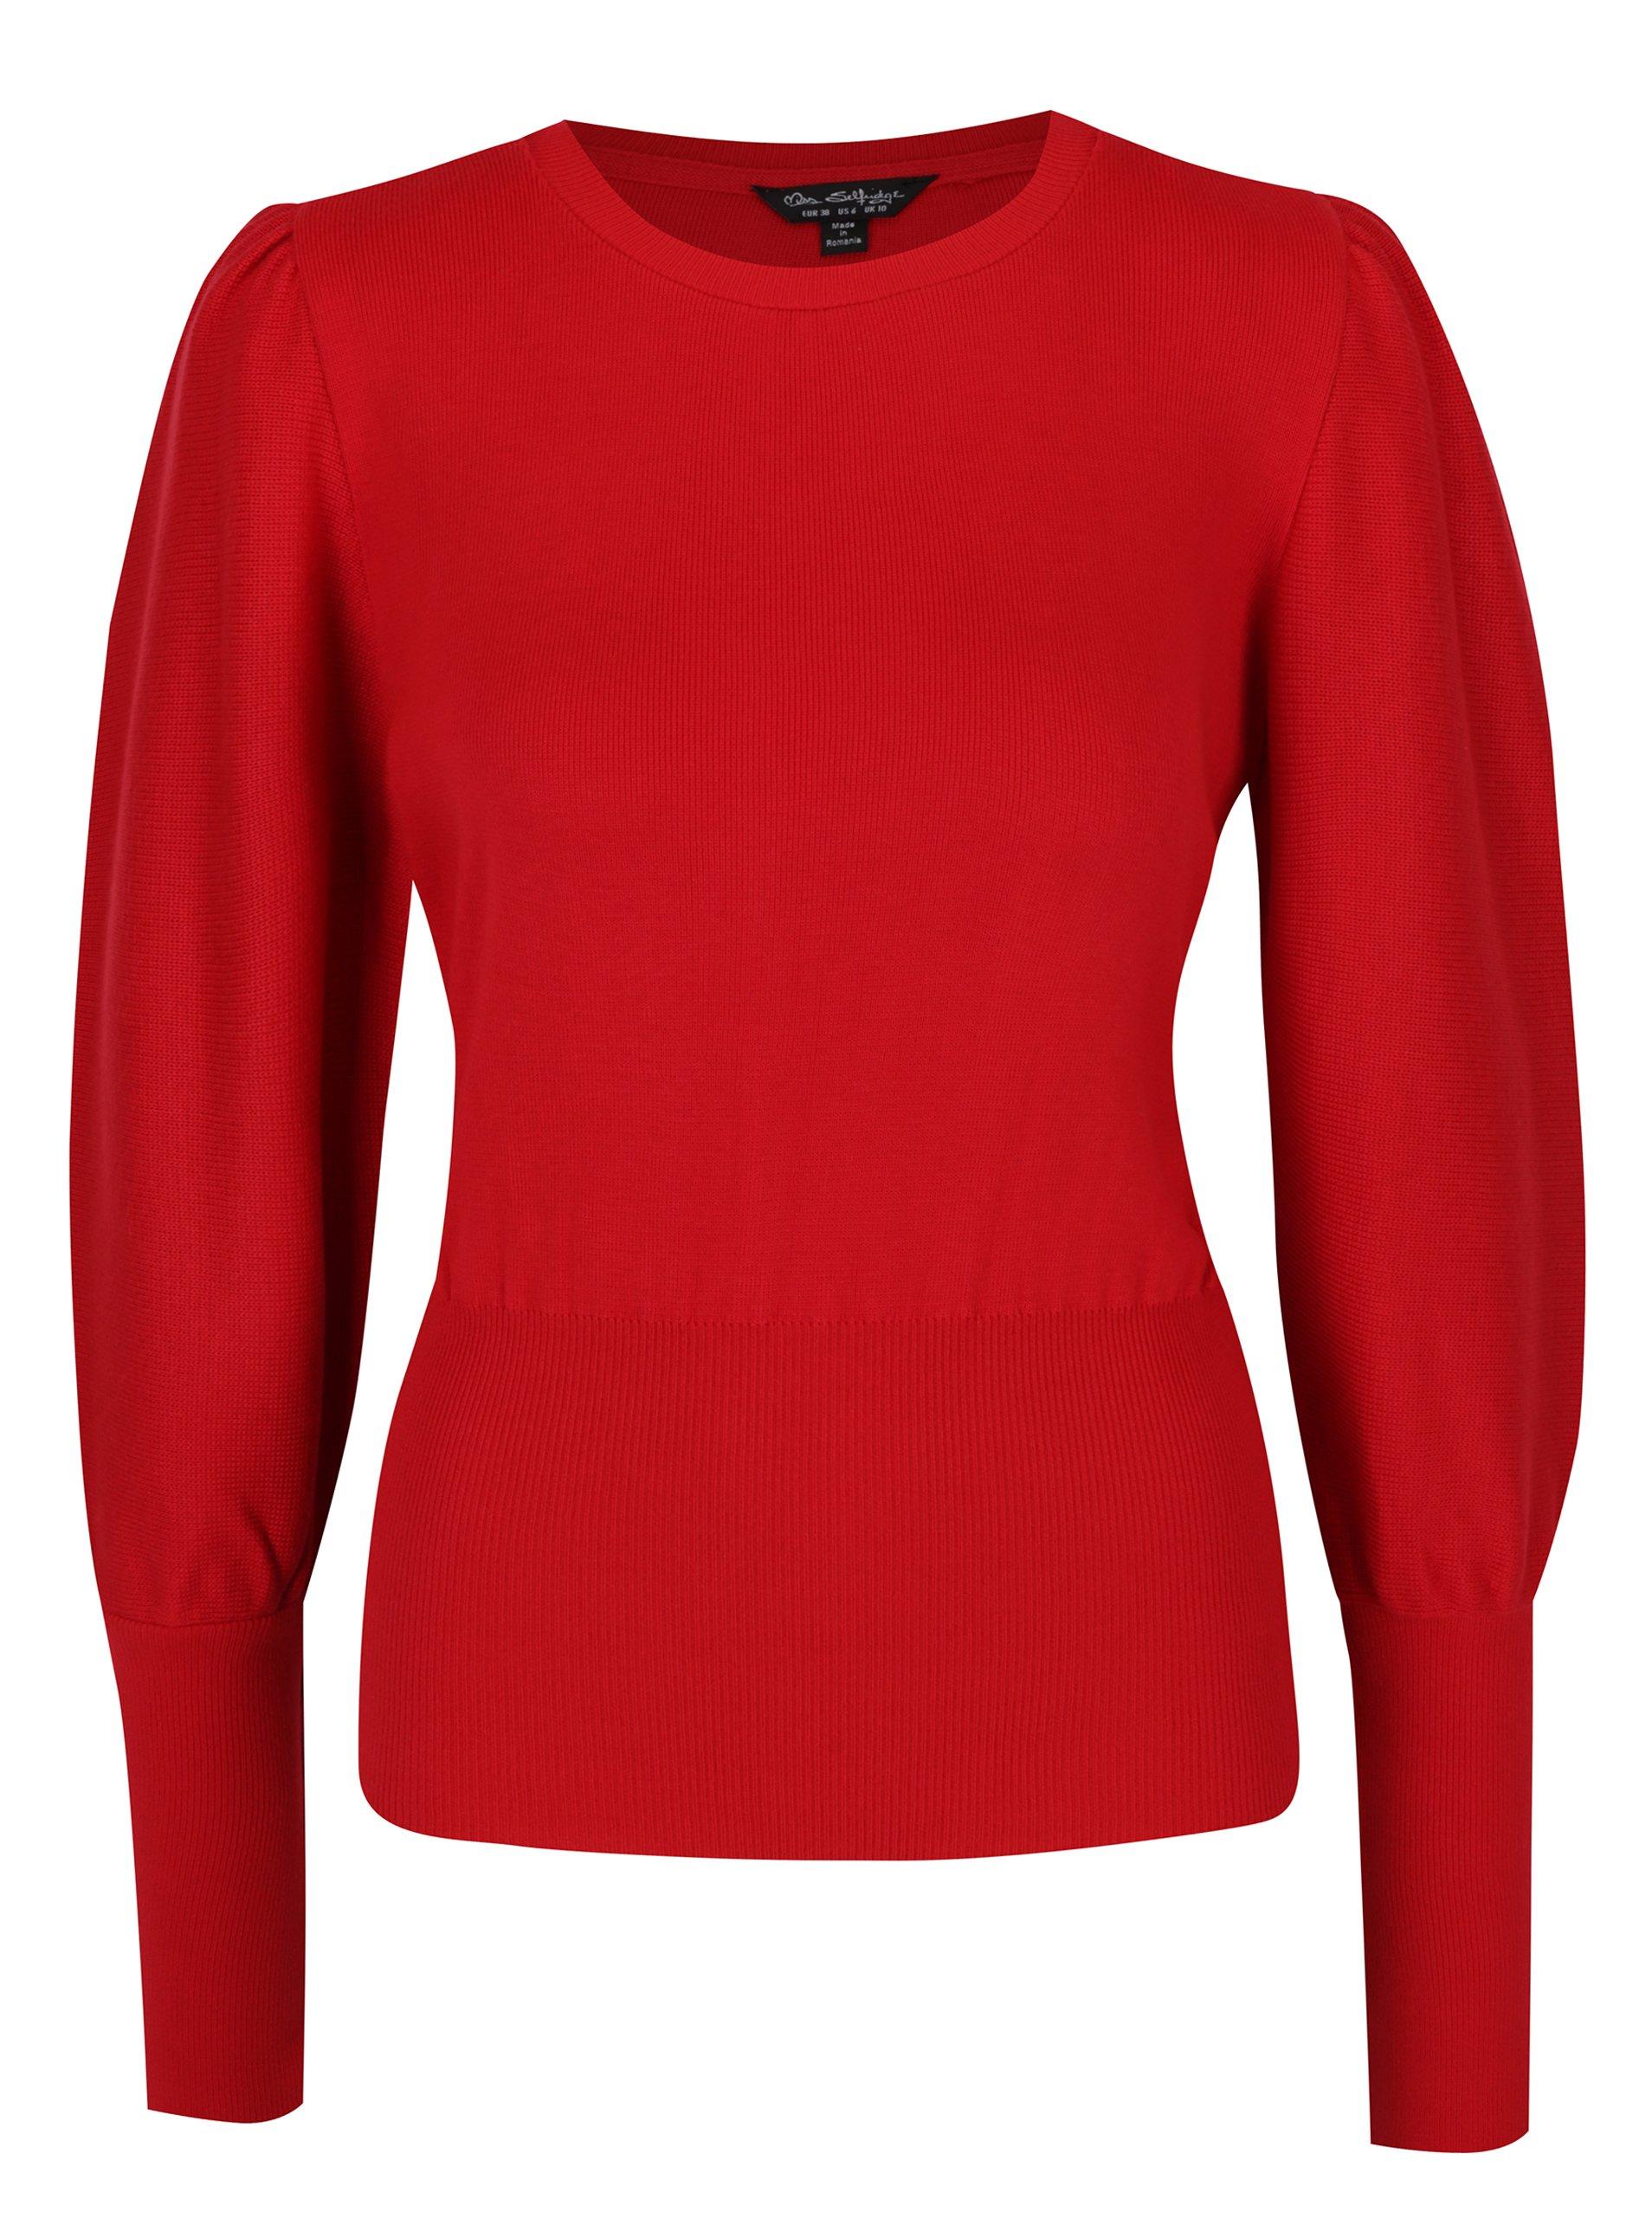 Červený svetr s balónovými rukávy Miss Selfridge